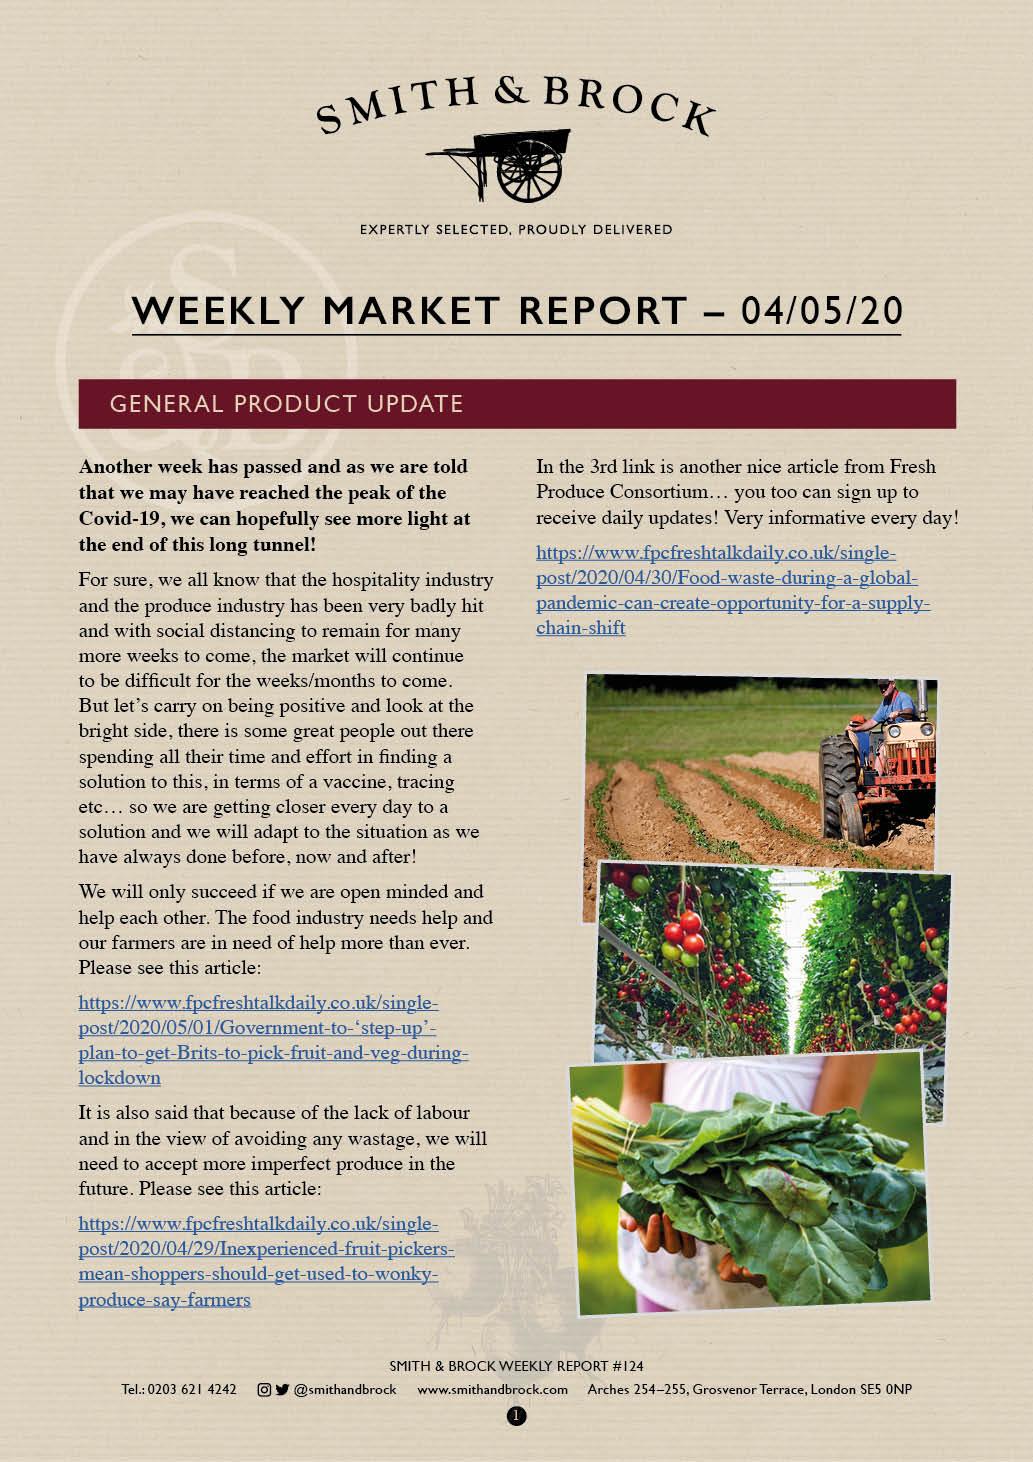 Smith&Brock Market Report 01 may 2020 124